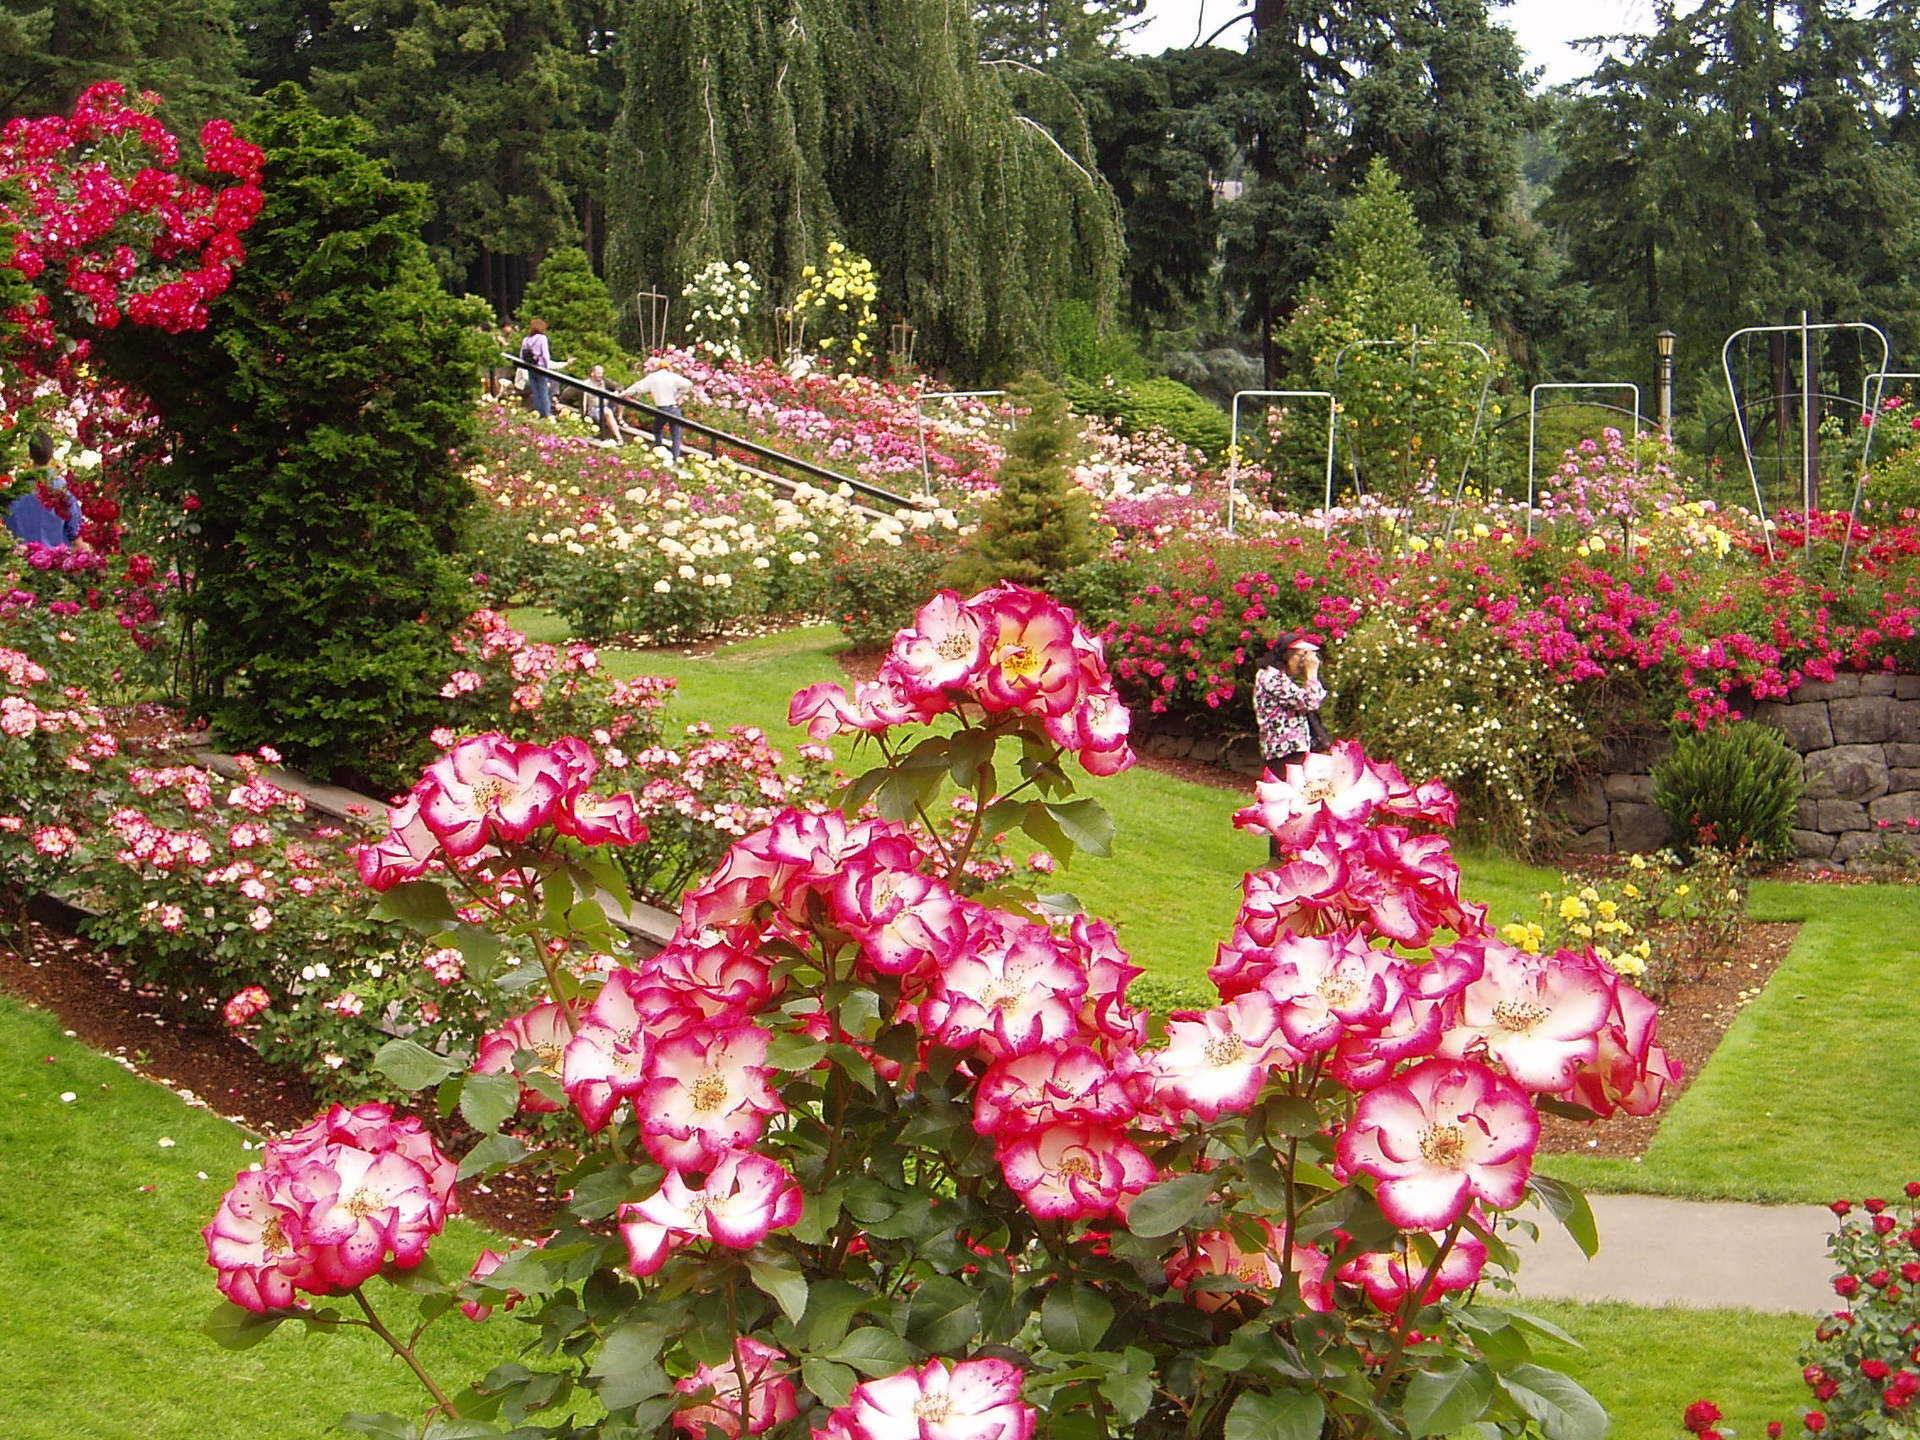 Portland Rose Garden Wallpaper 692412 Fanpop